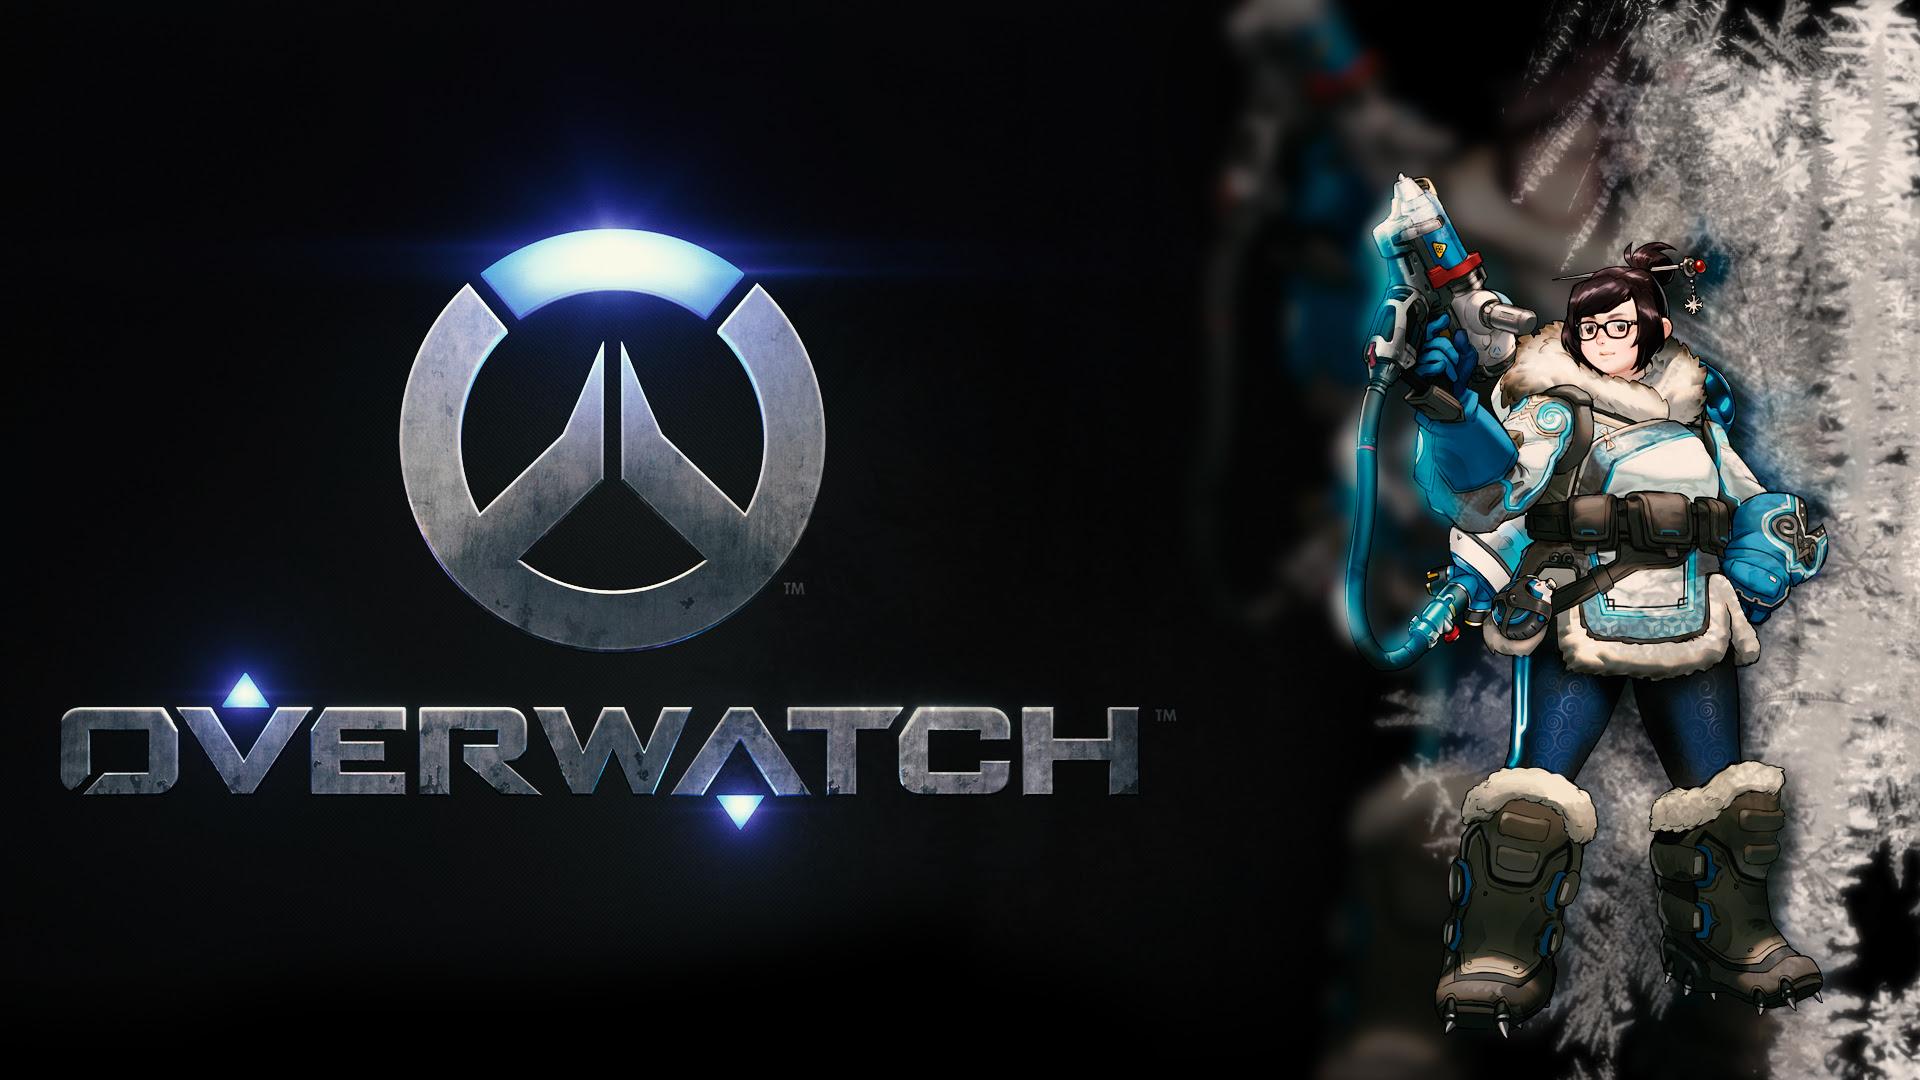 Unduh 62 Wallpaper Hd Overwatch HD Terbaru